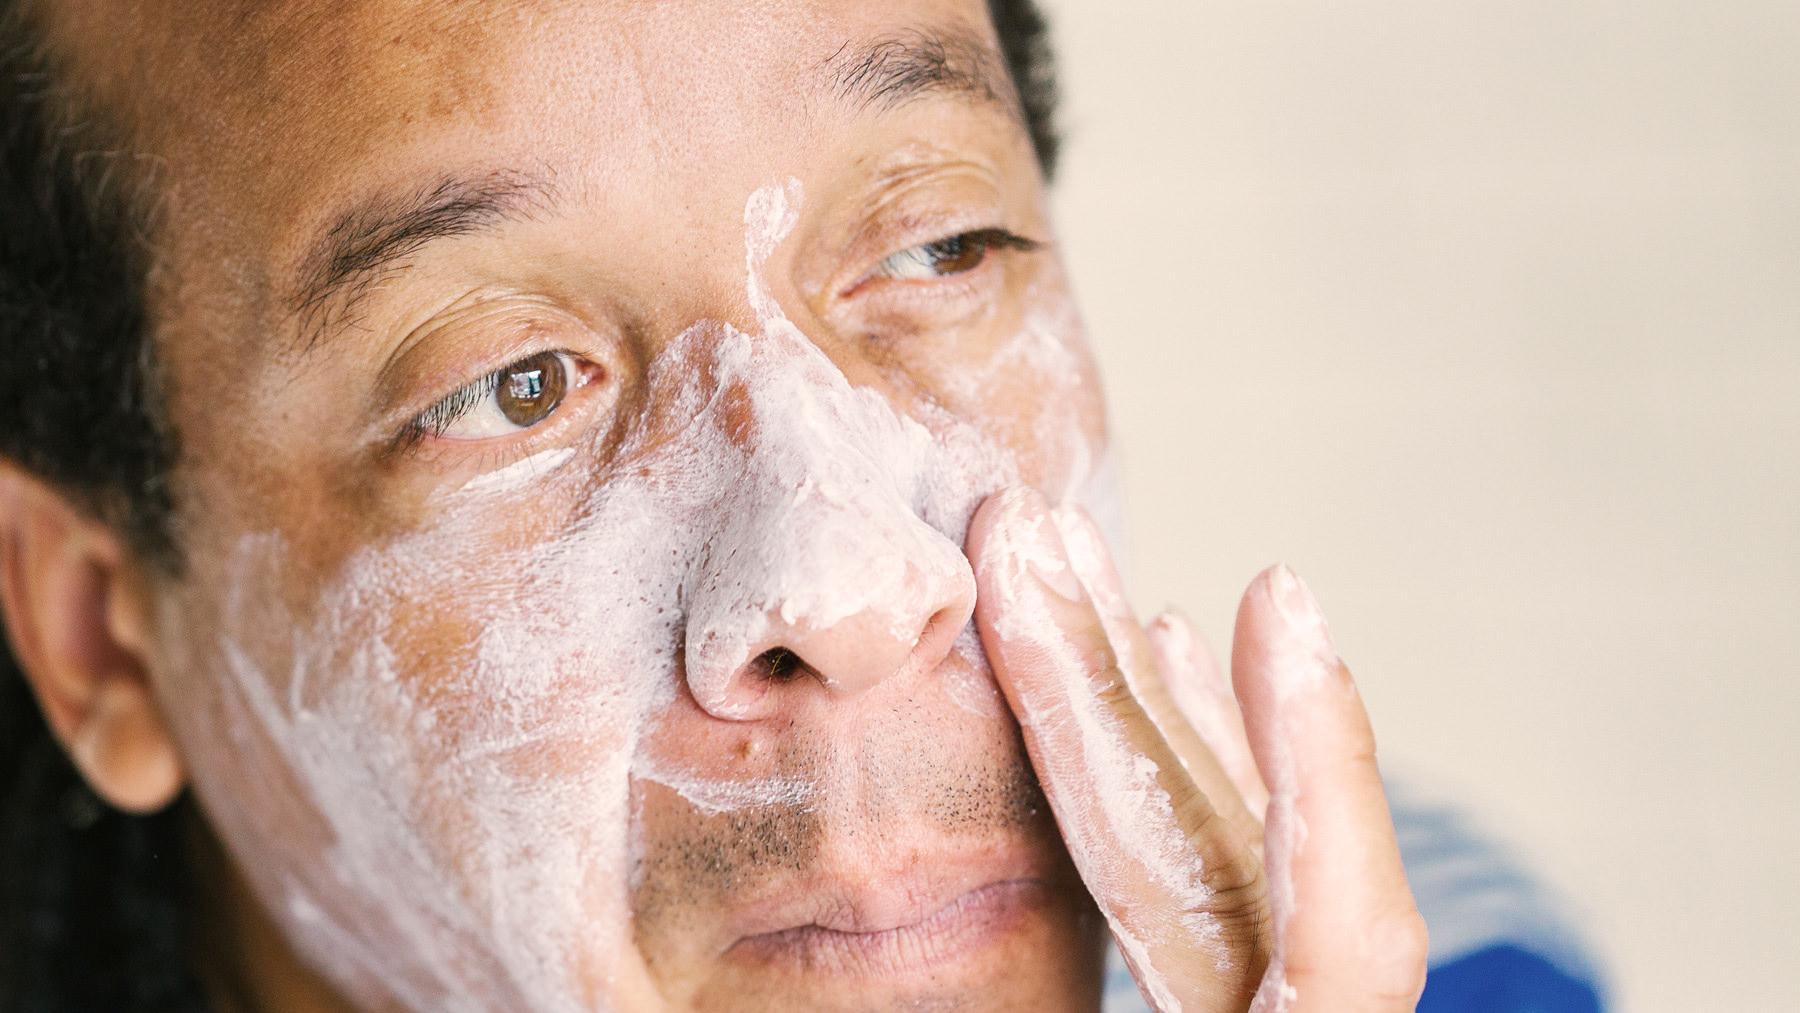 Fomo jelly face mask